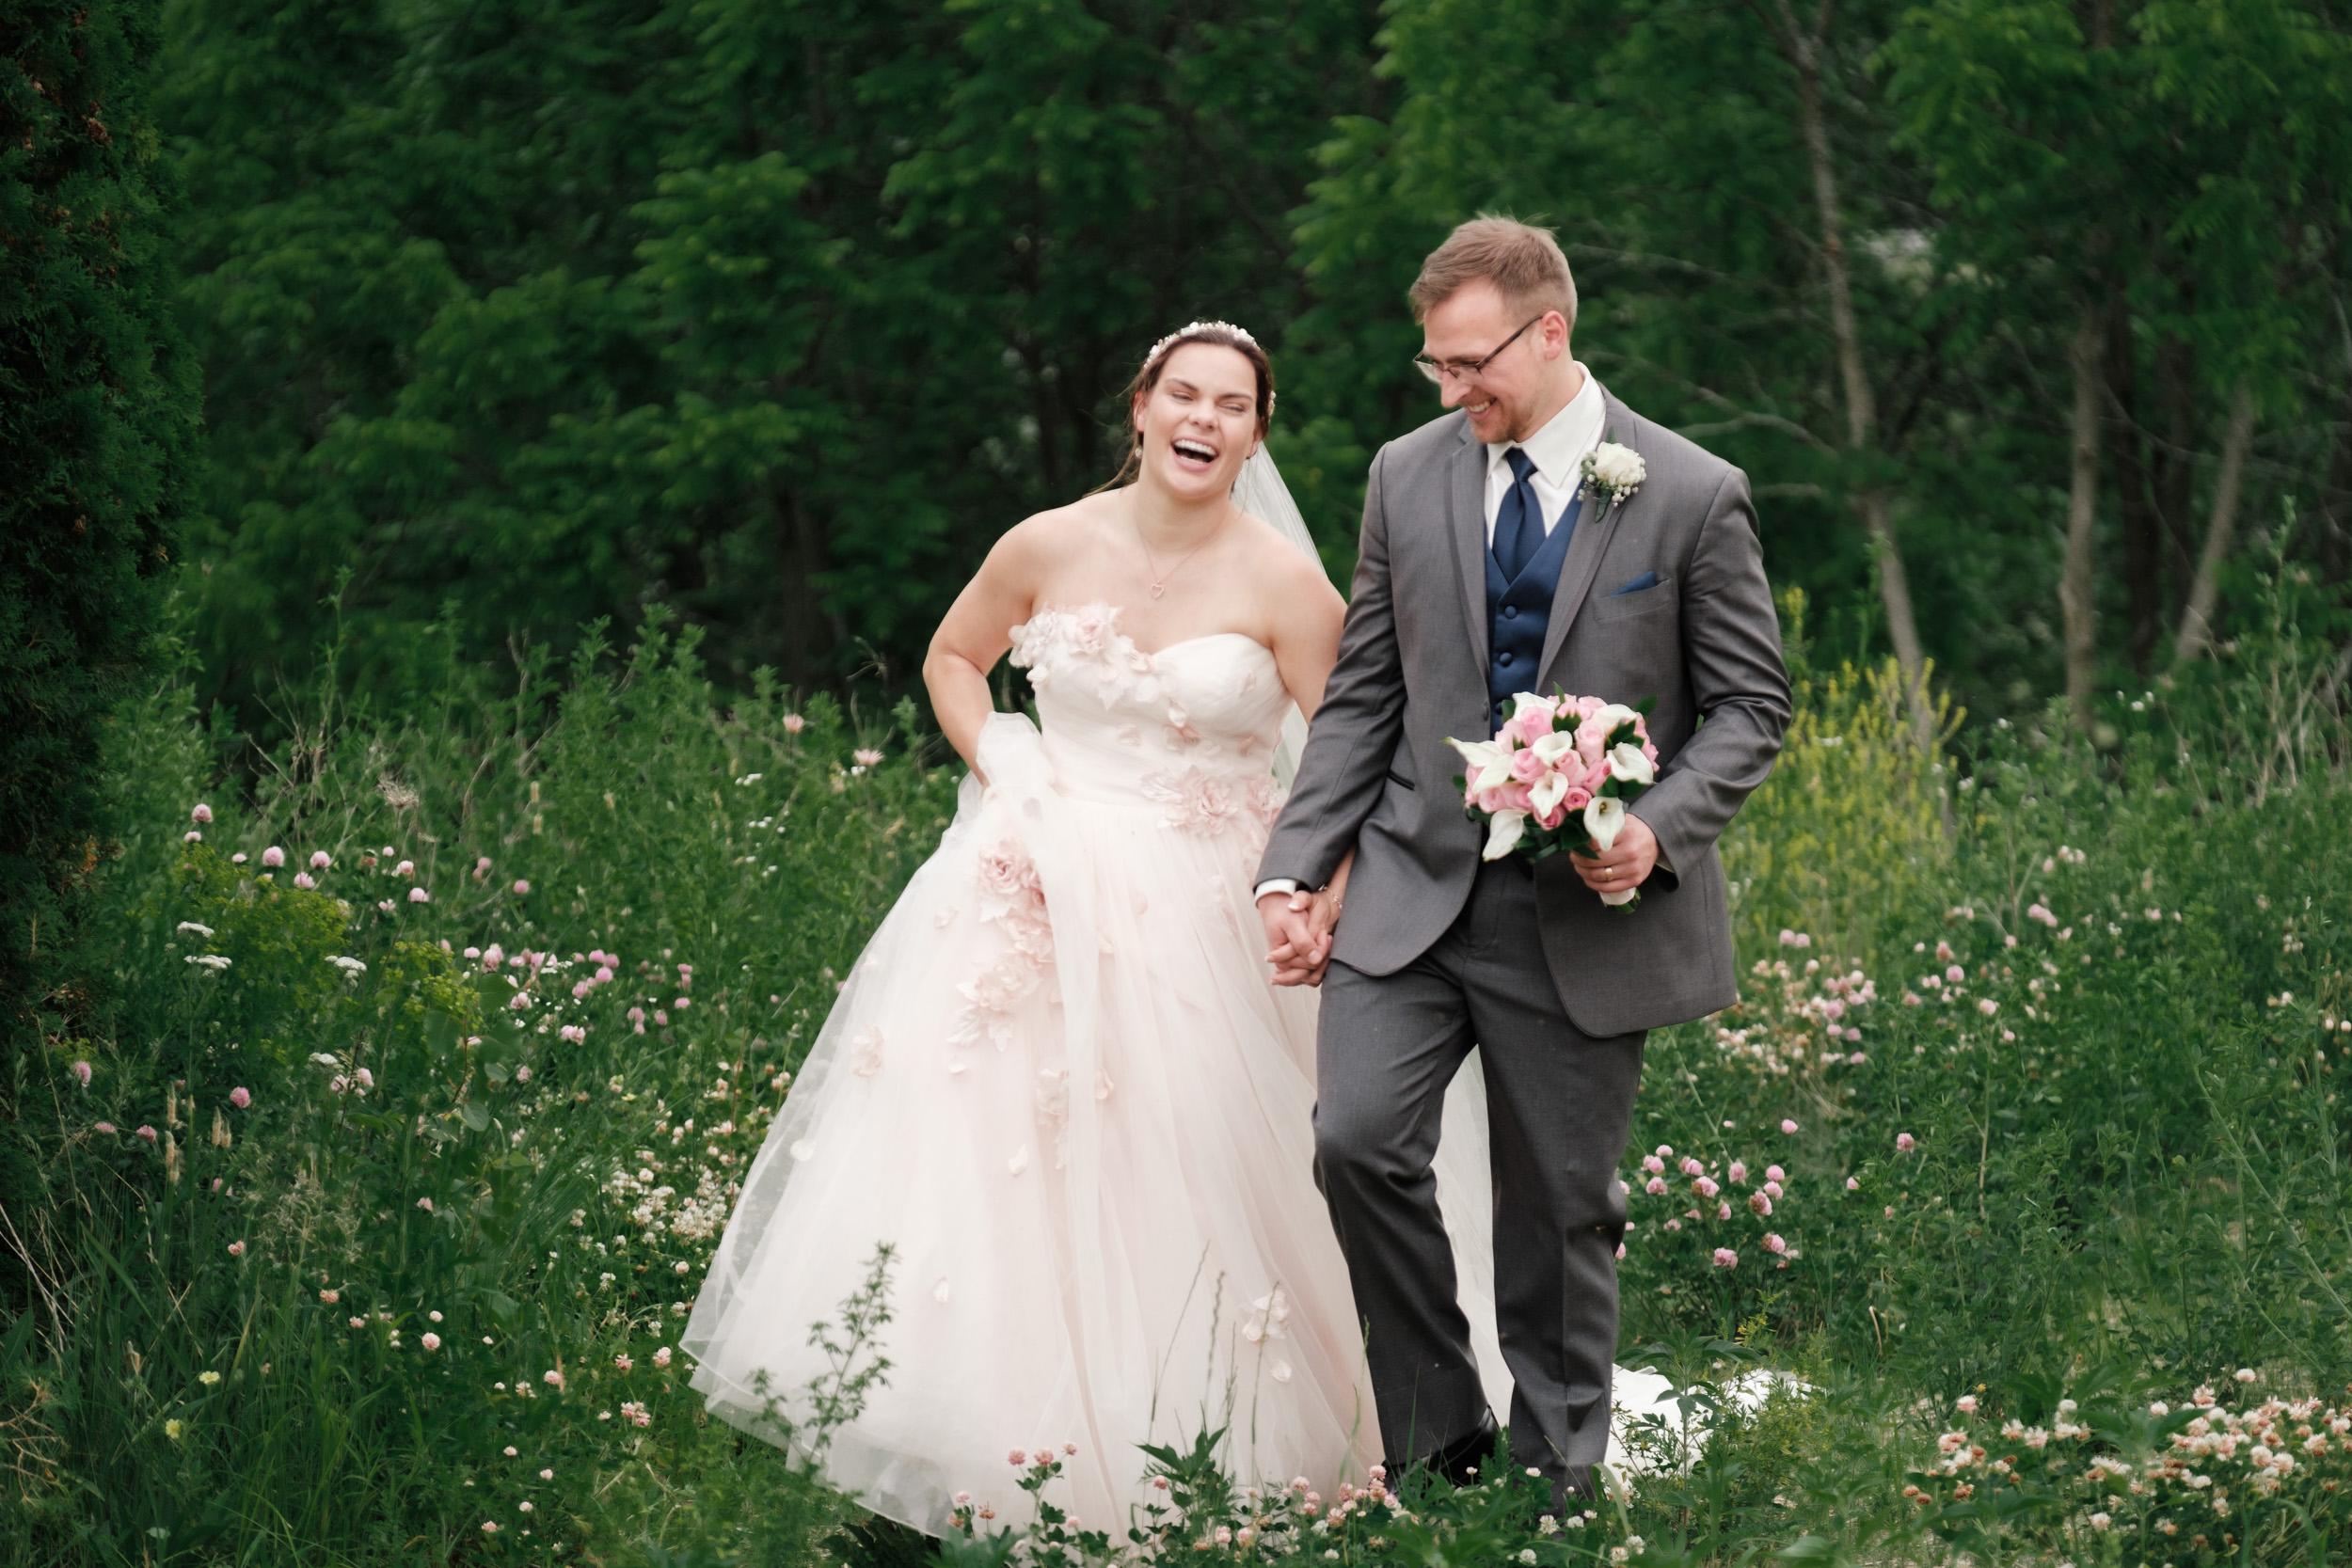 19-06-22-Ryan-Katie-The-Fields-Reserve-Wedding-52.jpg